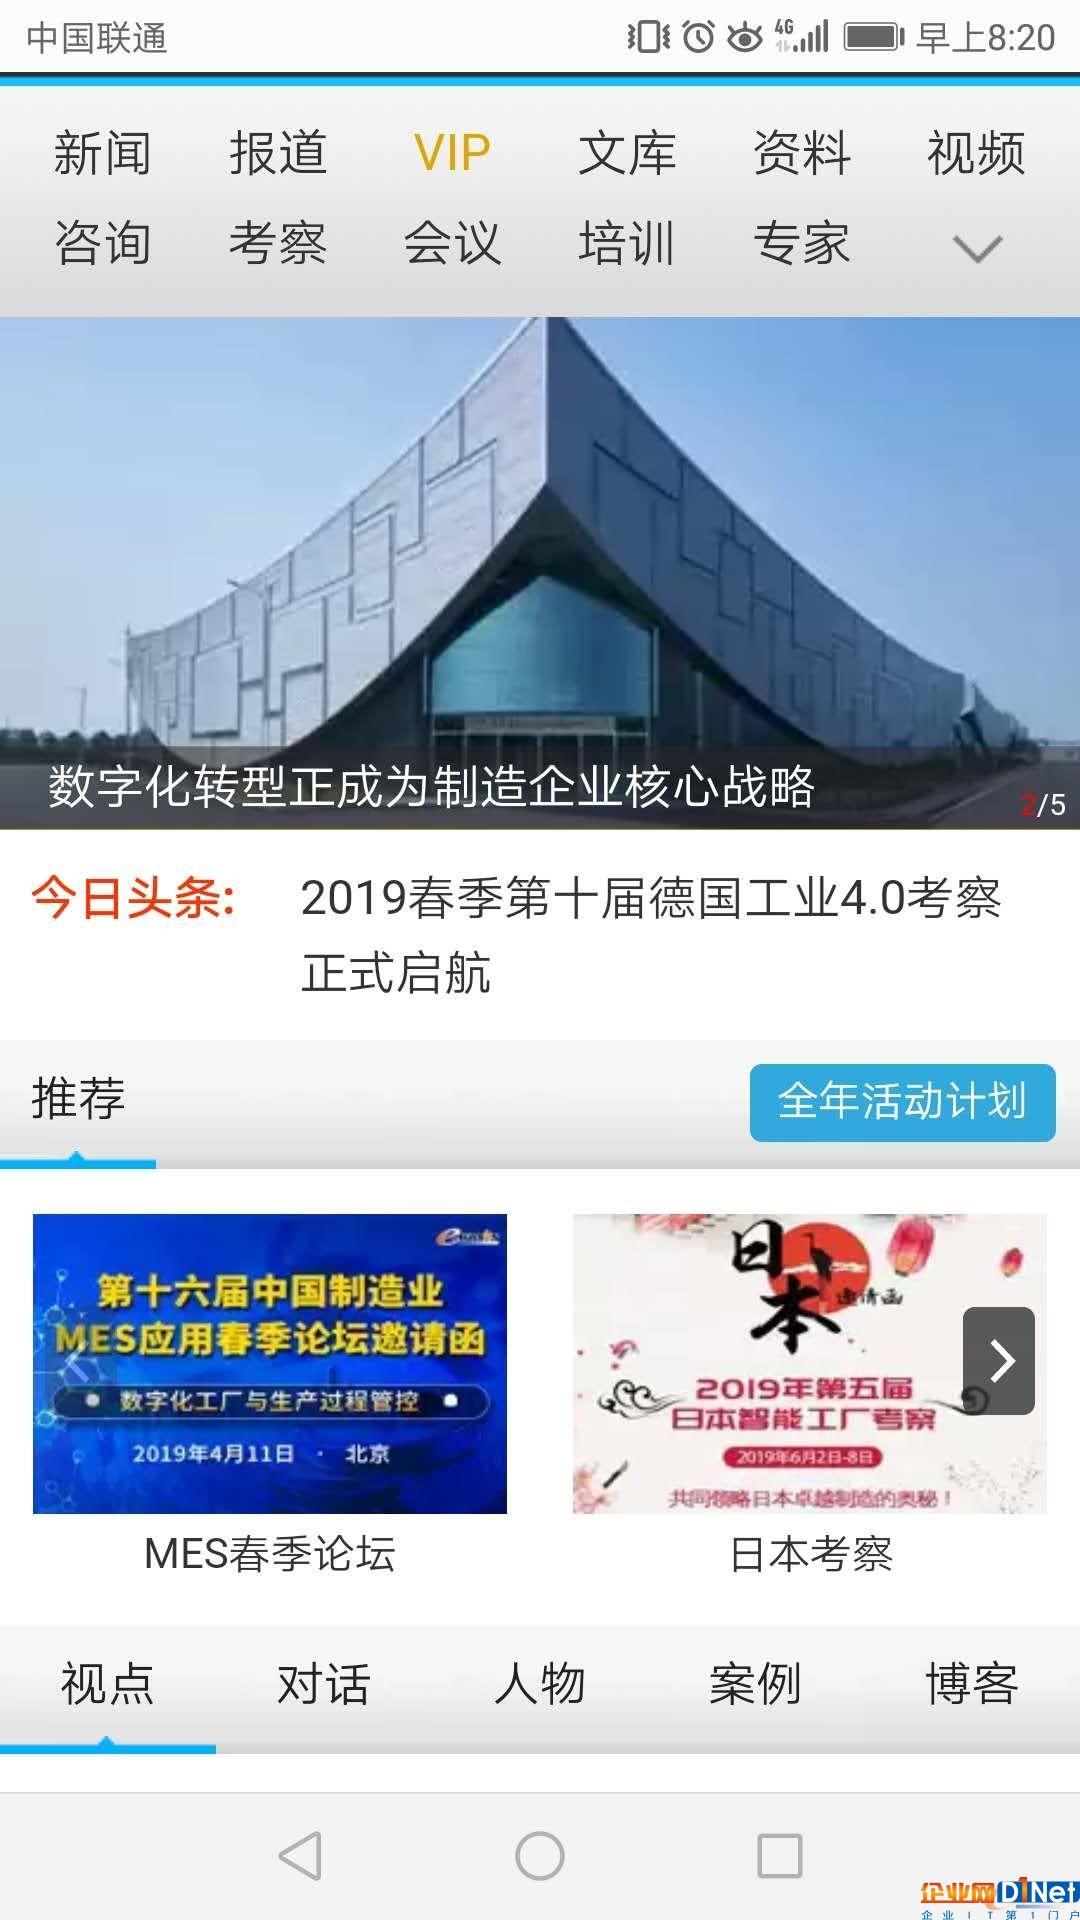 e-works数字化企业网全新手机版页面